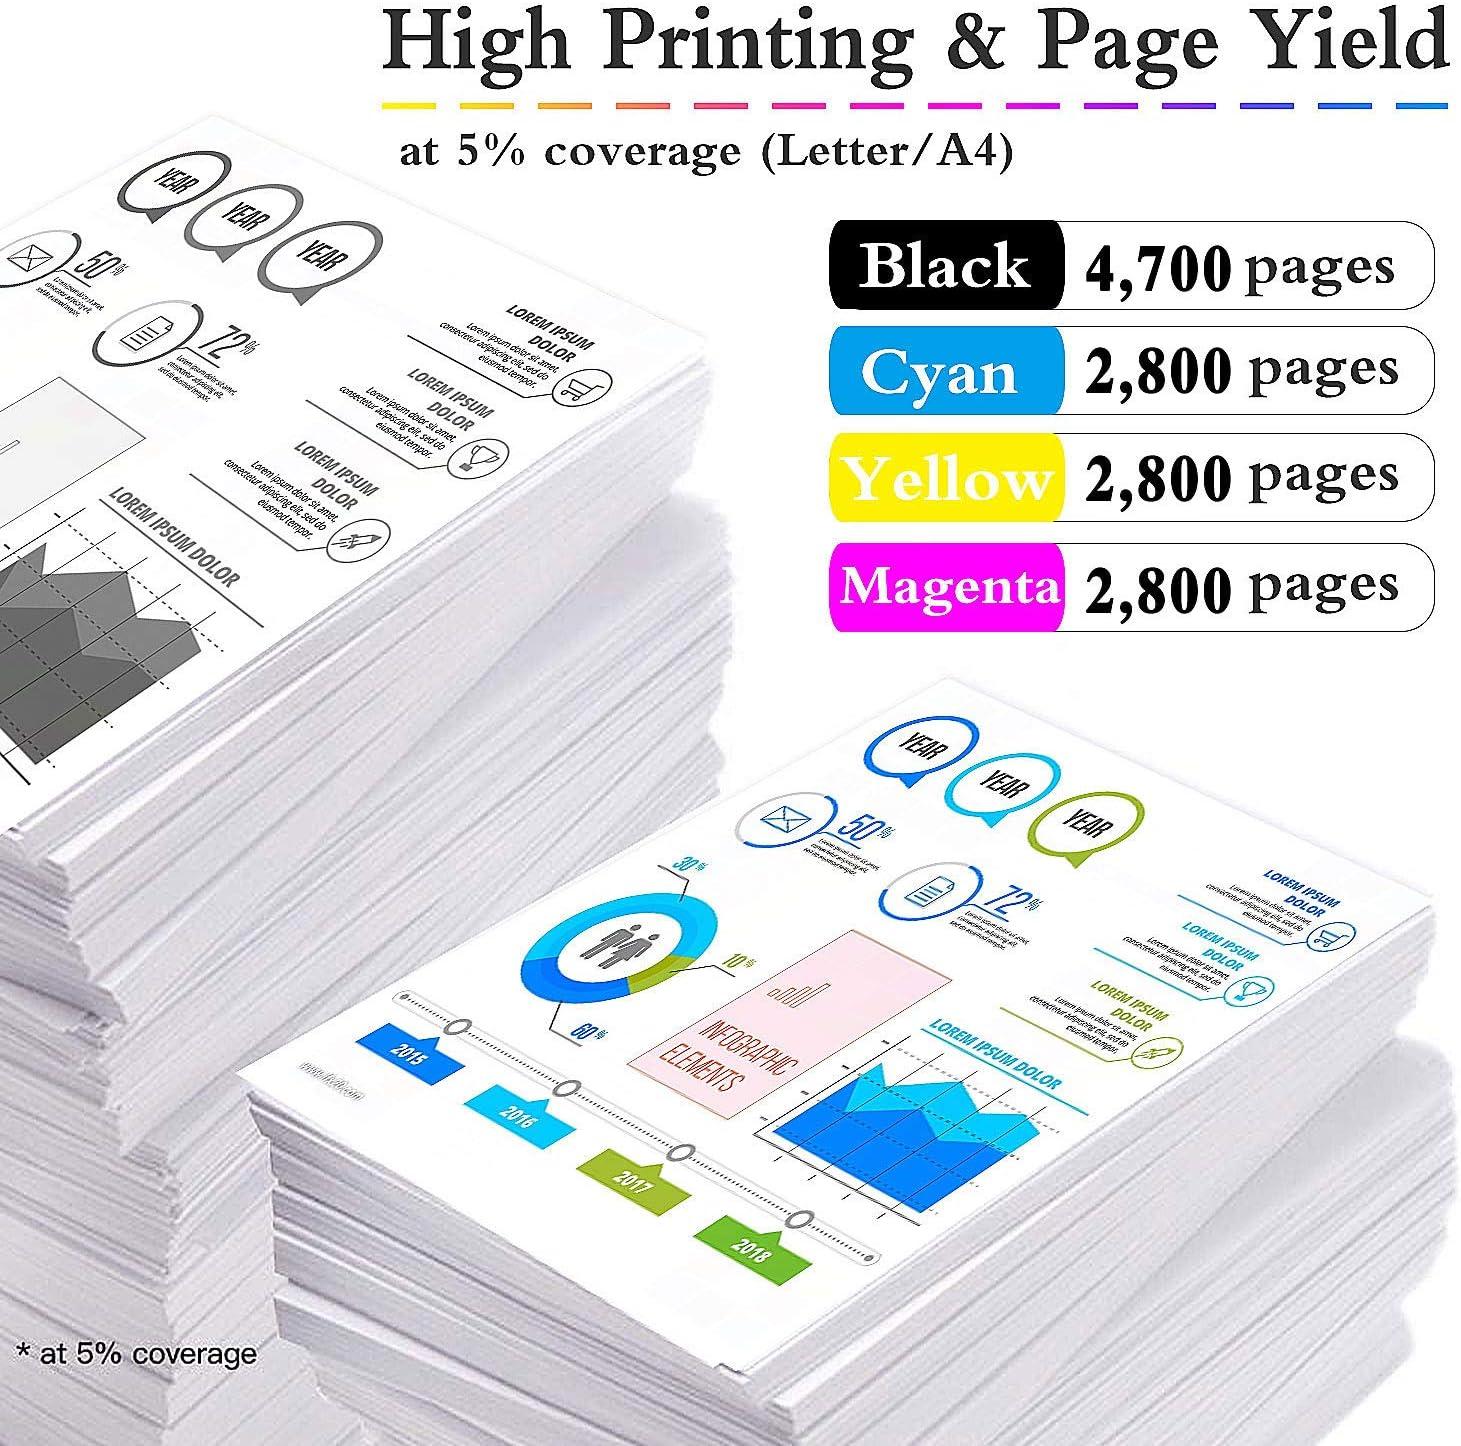 304X CC530X CC531X CC532X CC533X High Yield Remanufactured Toner Cartridge Compatible for HP Color Laserjet CP2025 CP2025n CP2025dn CP2025x CM2320n CM2320fxi CM2320nf Printer 6 Pack 3BK+1C+1Y+1M